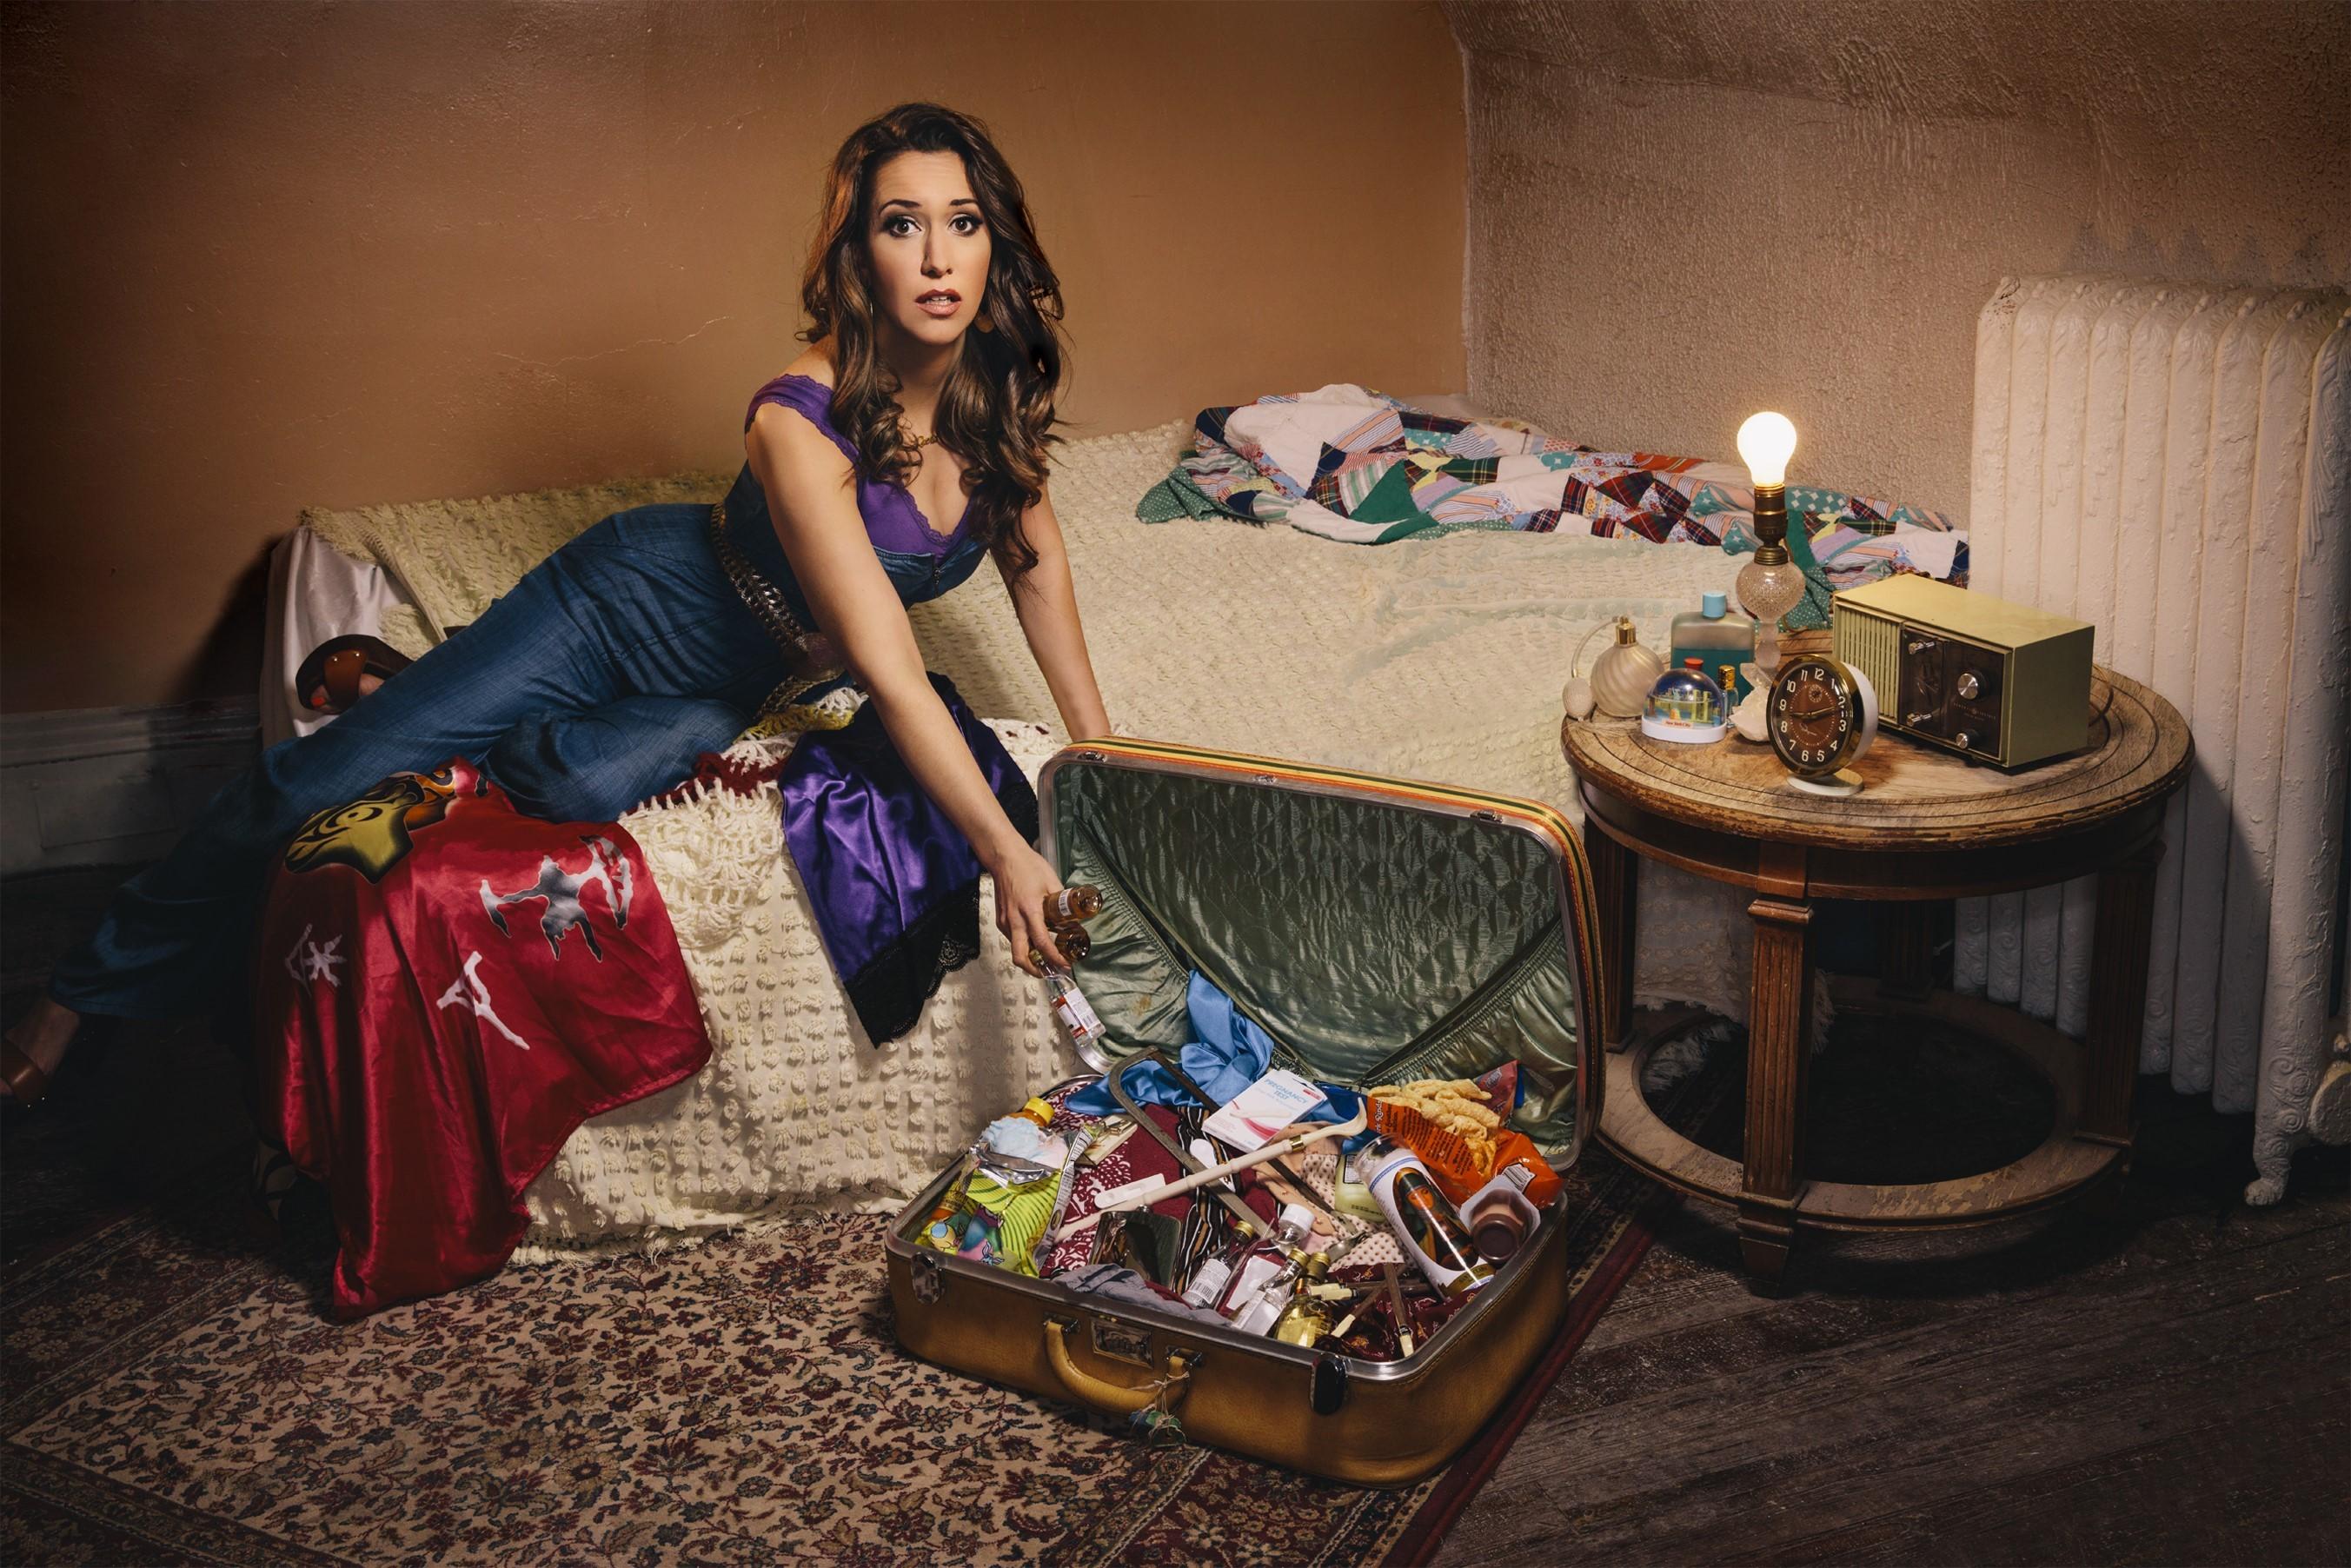 Rachel Feinstein - 7:30pm: Main Image